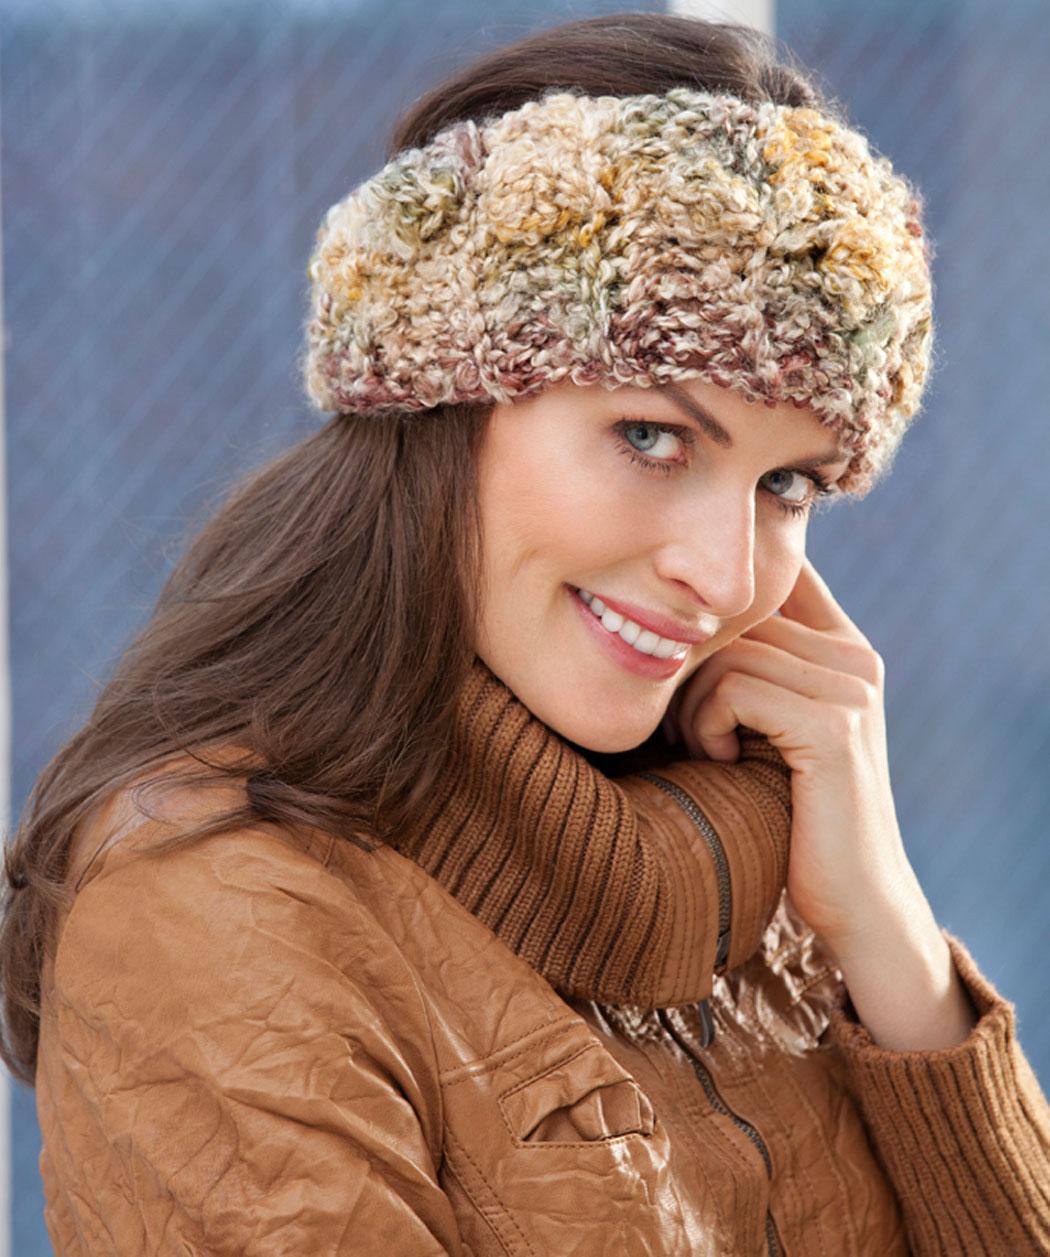 Knit Ear Warmer Pattern | A Knitting Blog